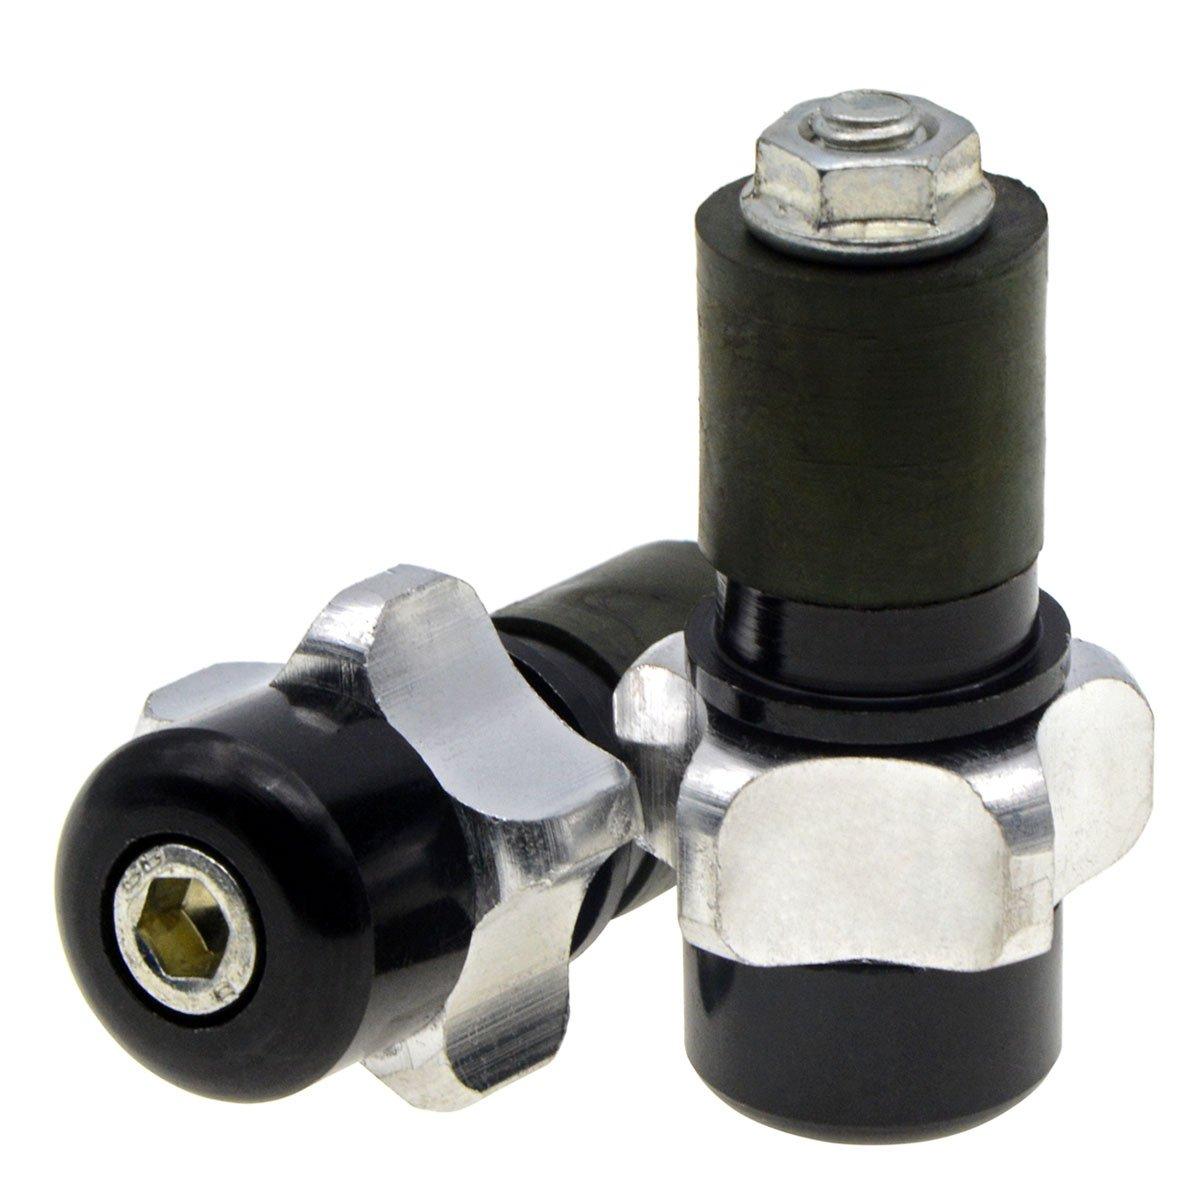 Aluminum Handlebar Plugs Weights Grip Sliders Silver ZYHW Anti-Vibration Bar Ends